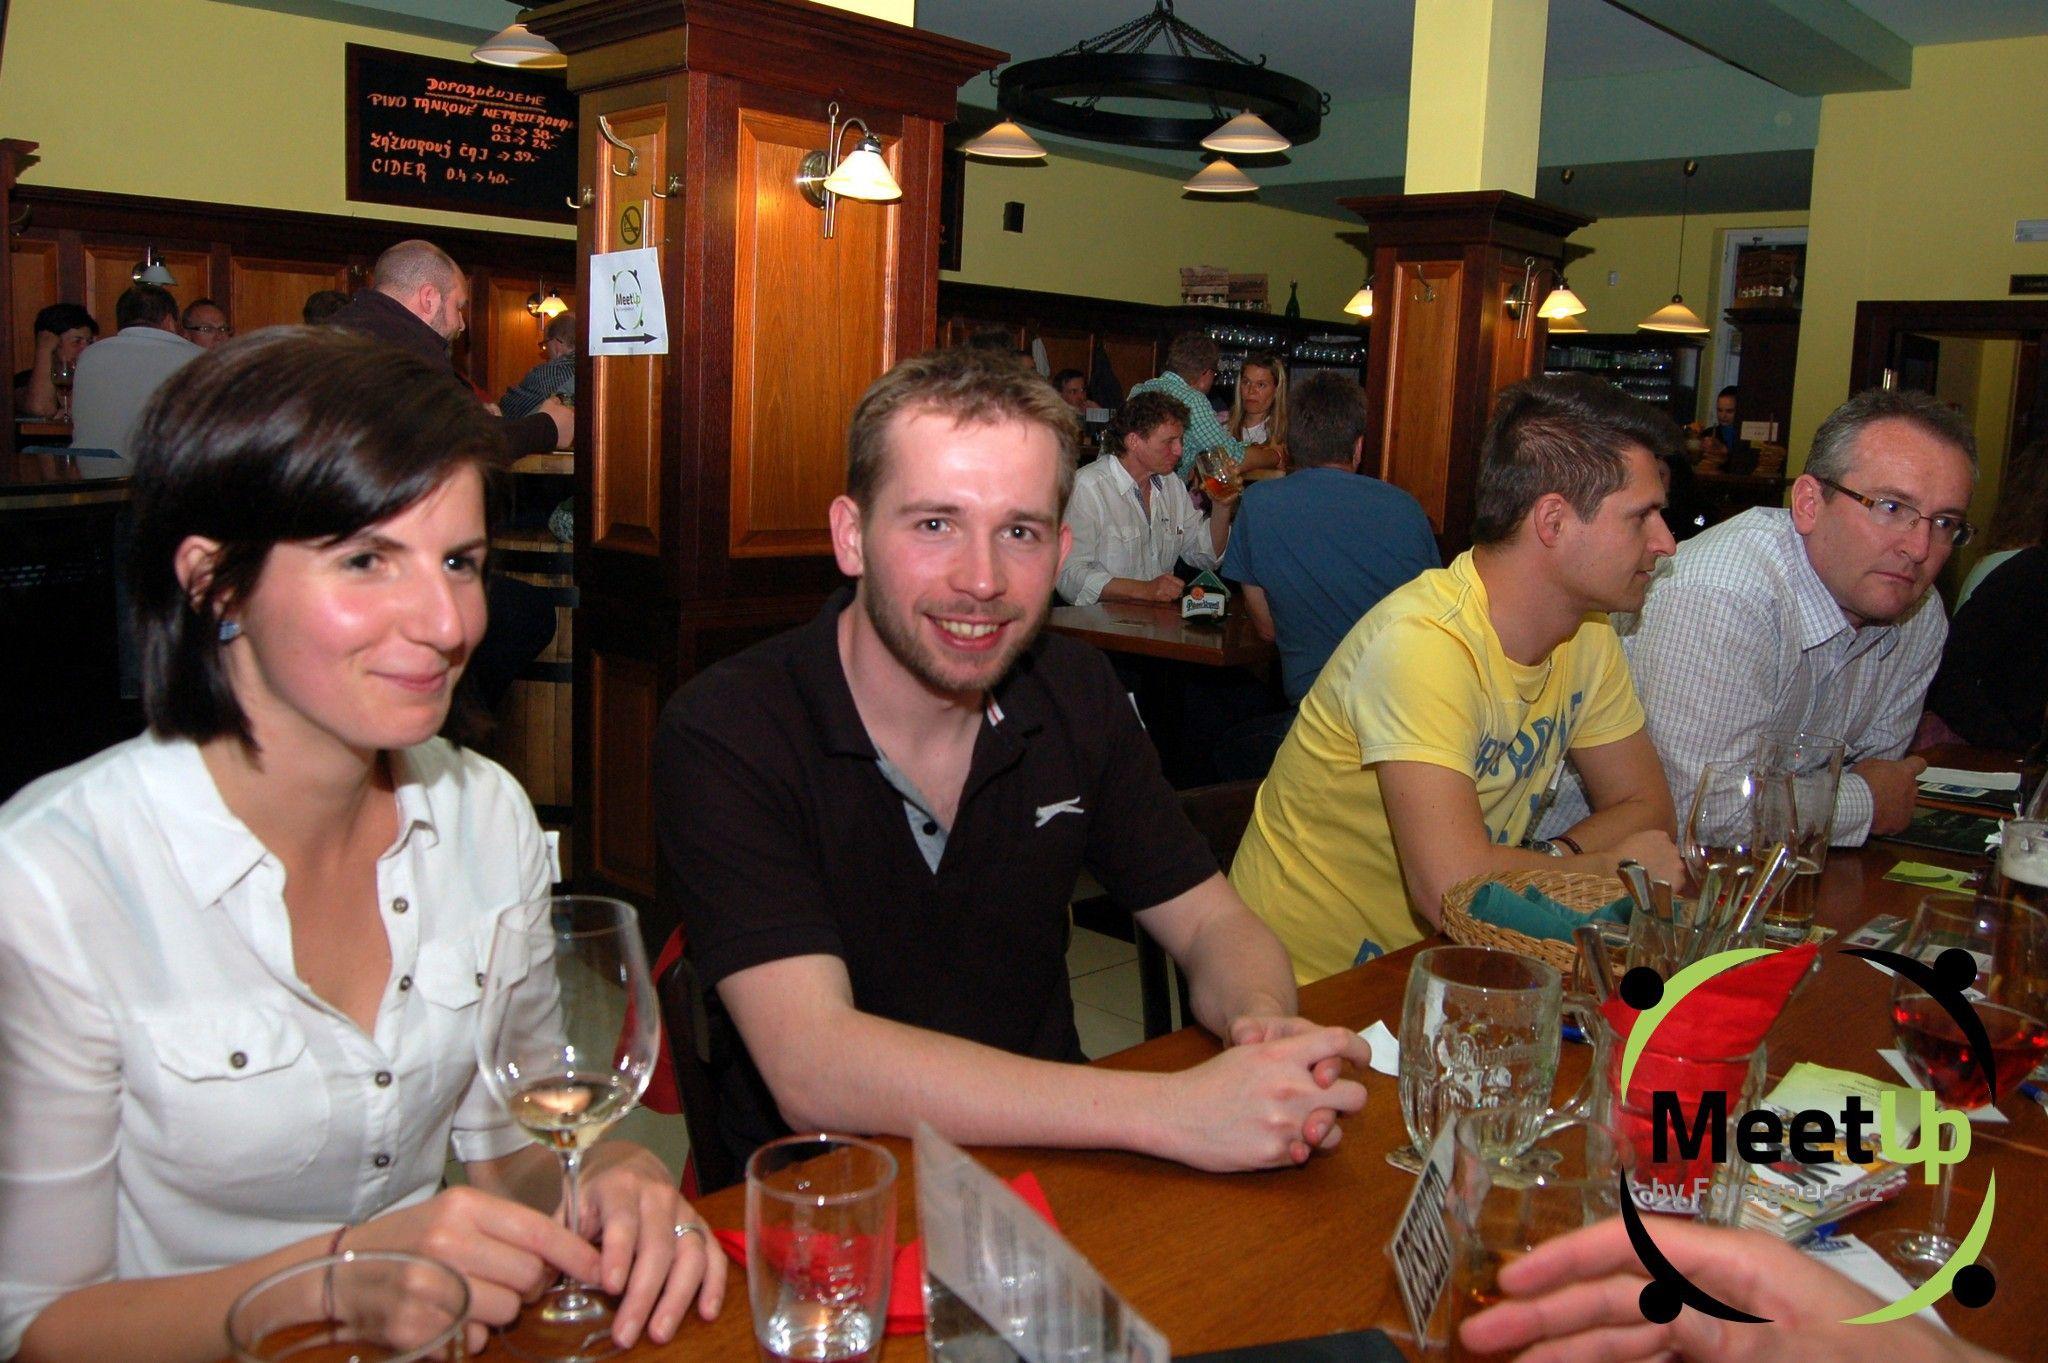 Foreigners Pilsen (Plzeň) MeetUp